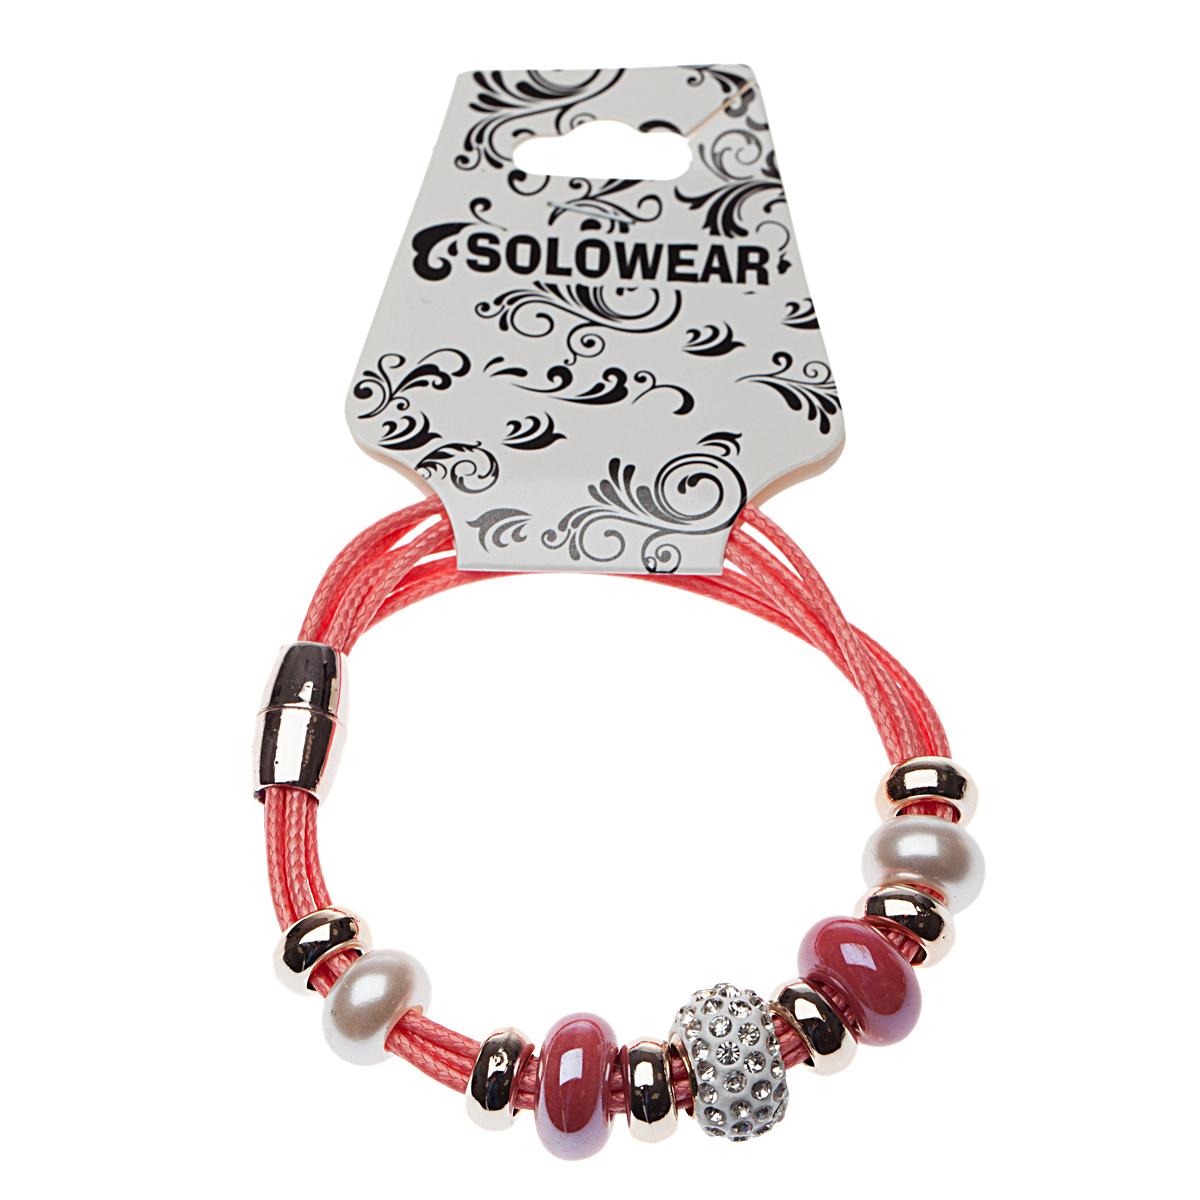 Браслет Solowear, 4620-3 браслет solowear 4620 7